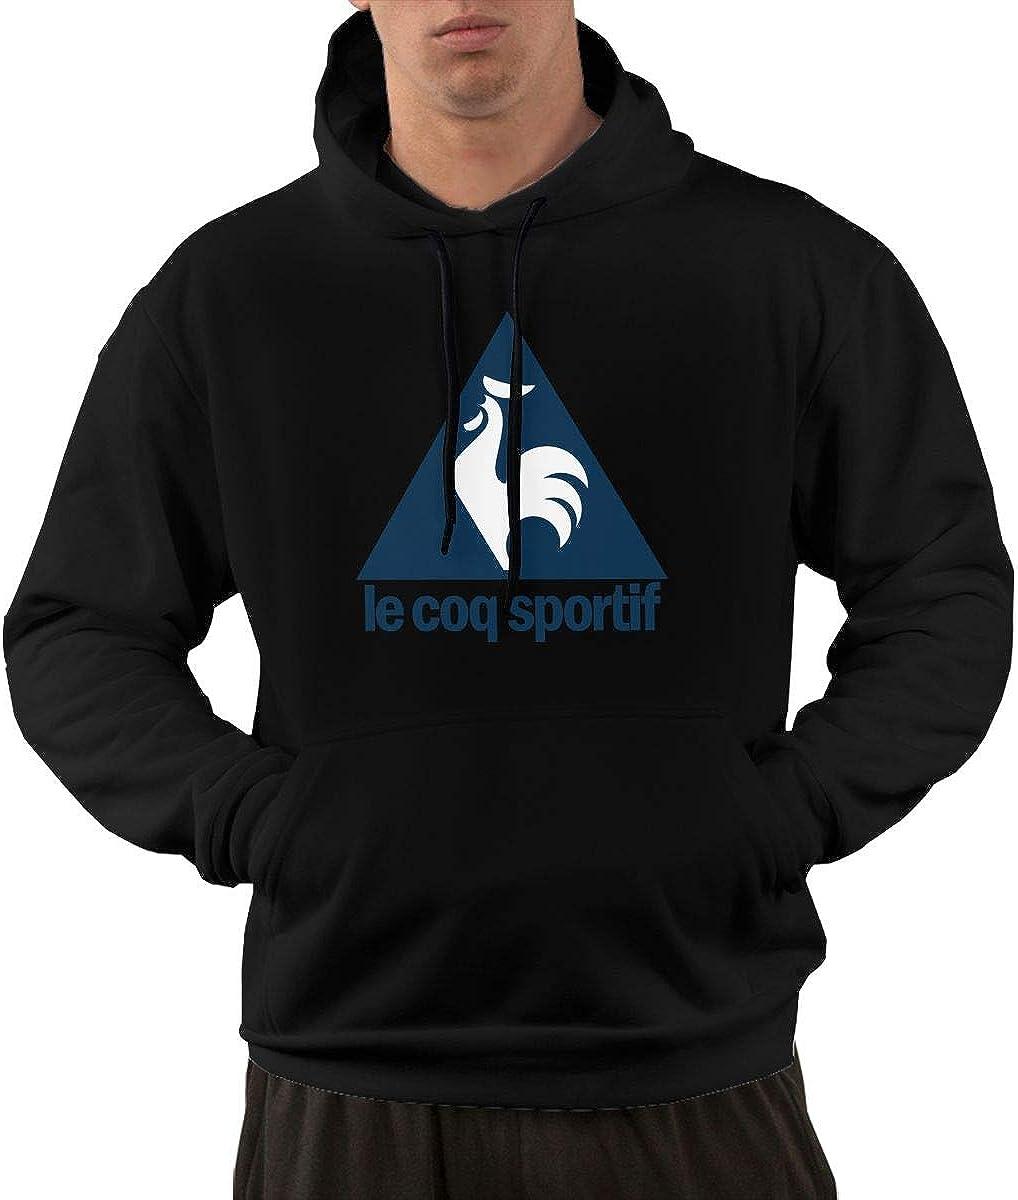 Leephen Mens Sweatshirt Print Le Coq Sportif Logo Fleece Pullover Hooded